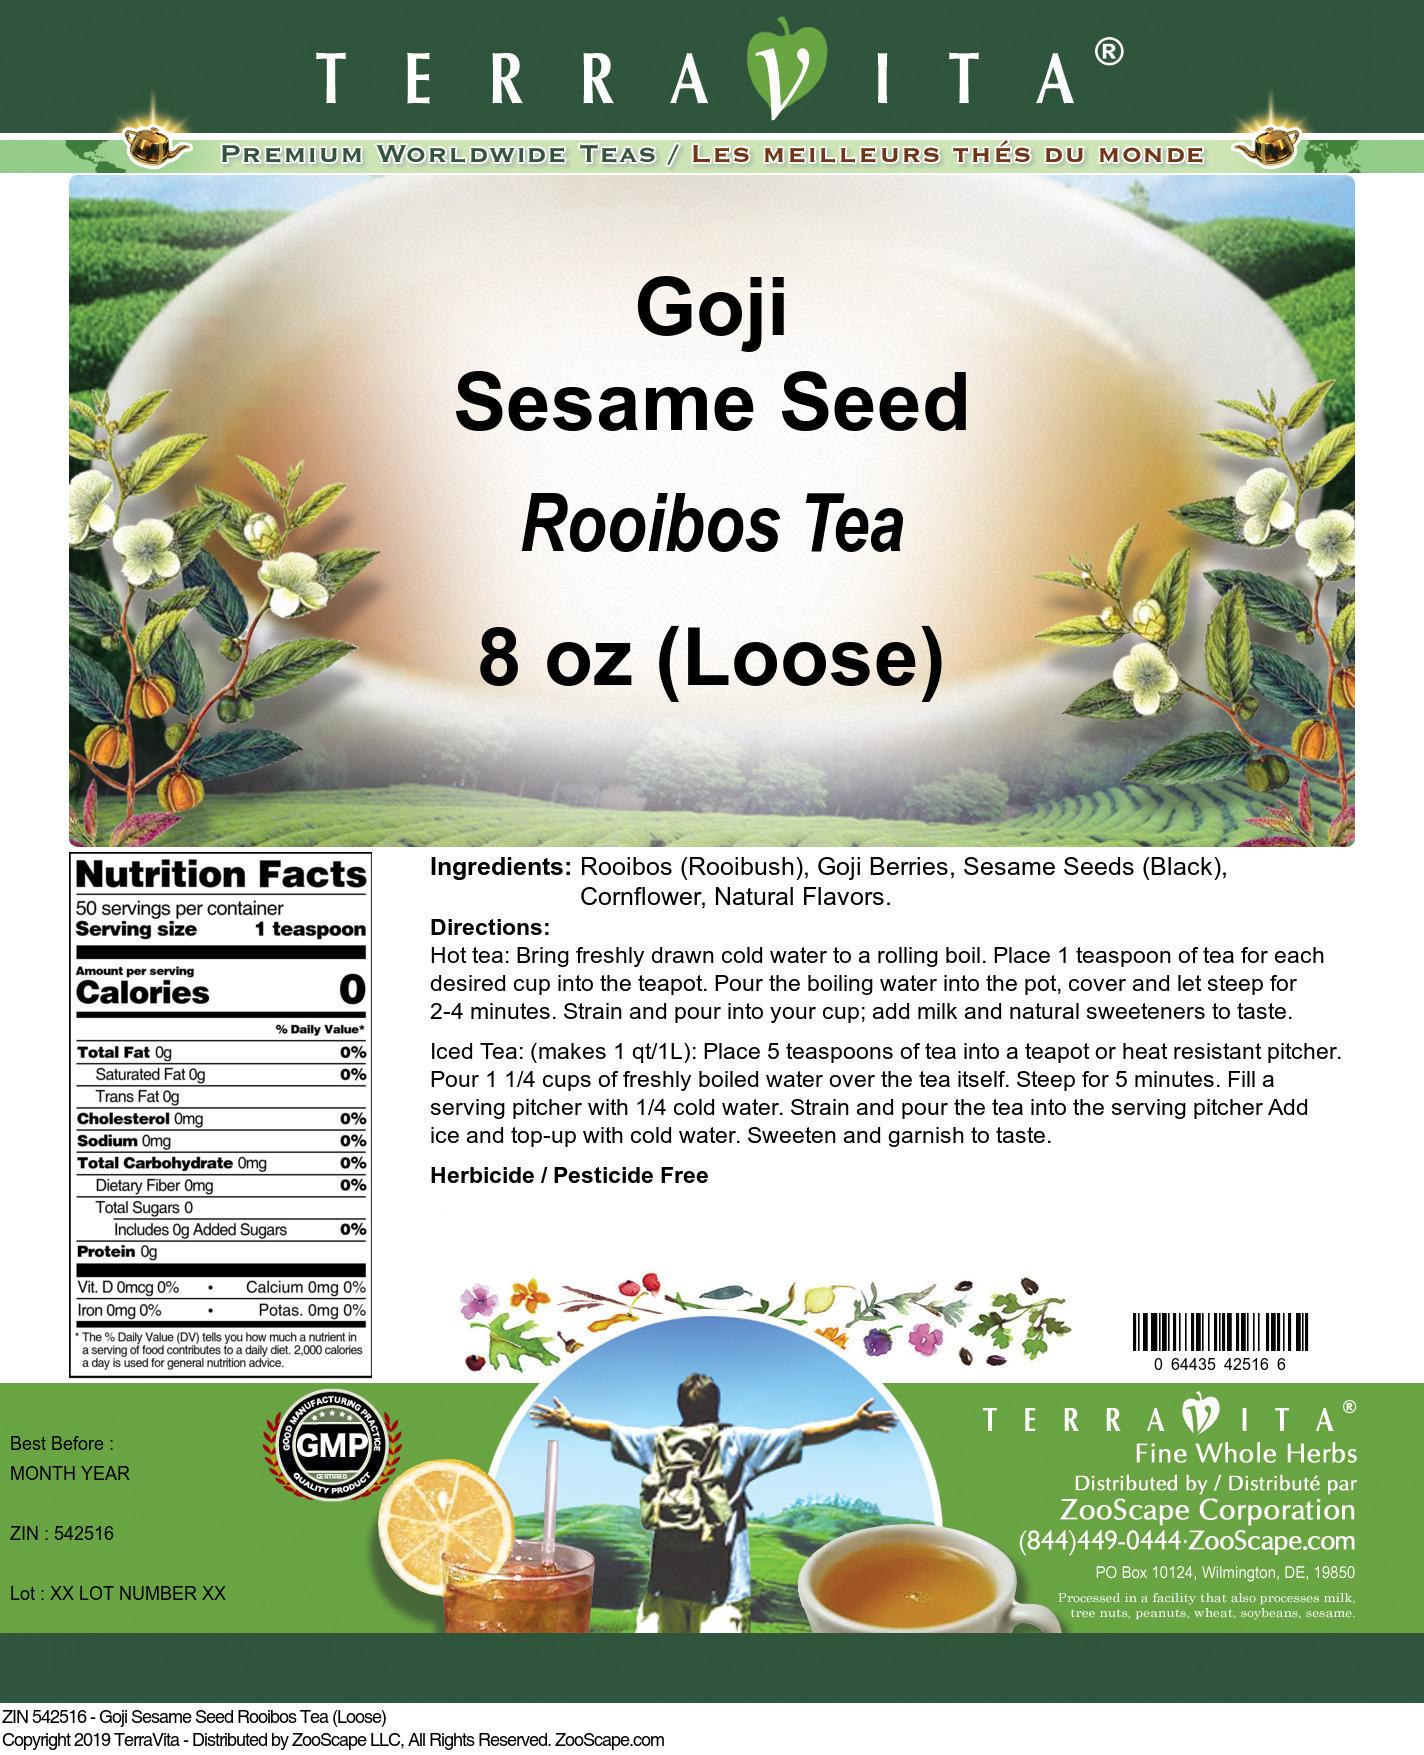 Goji Sesame Seed Rooibos Tea (Loose)